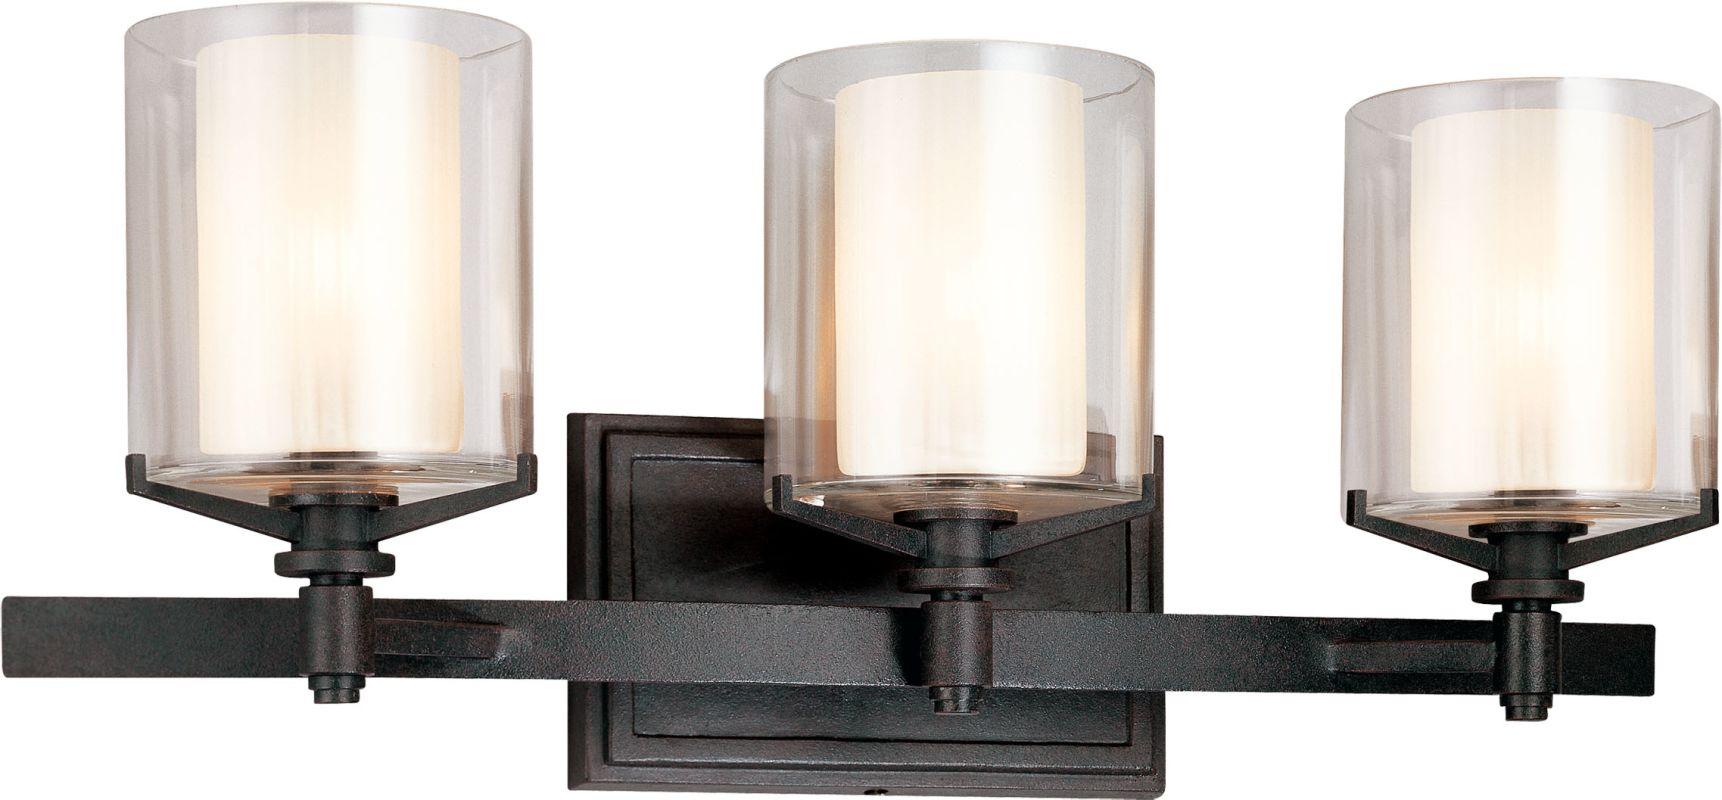 Troy Lighting B1713FR French Iron Contemporary Arcadia Bathroom Light